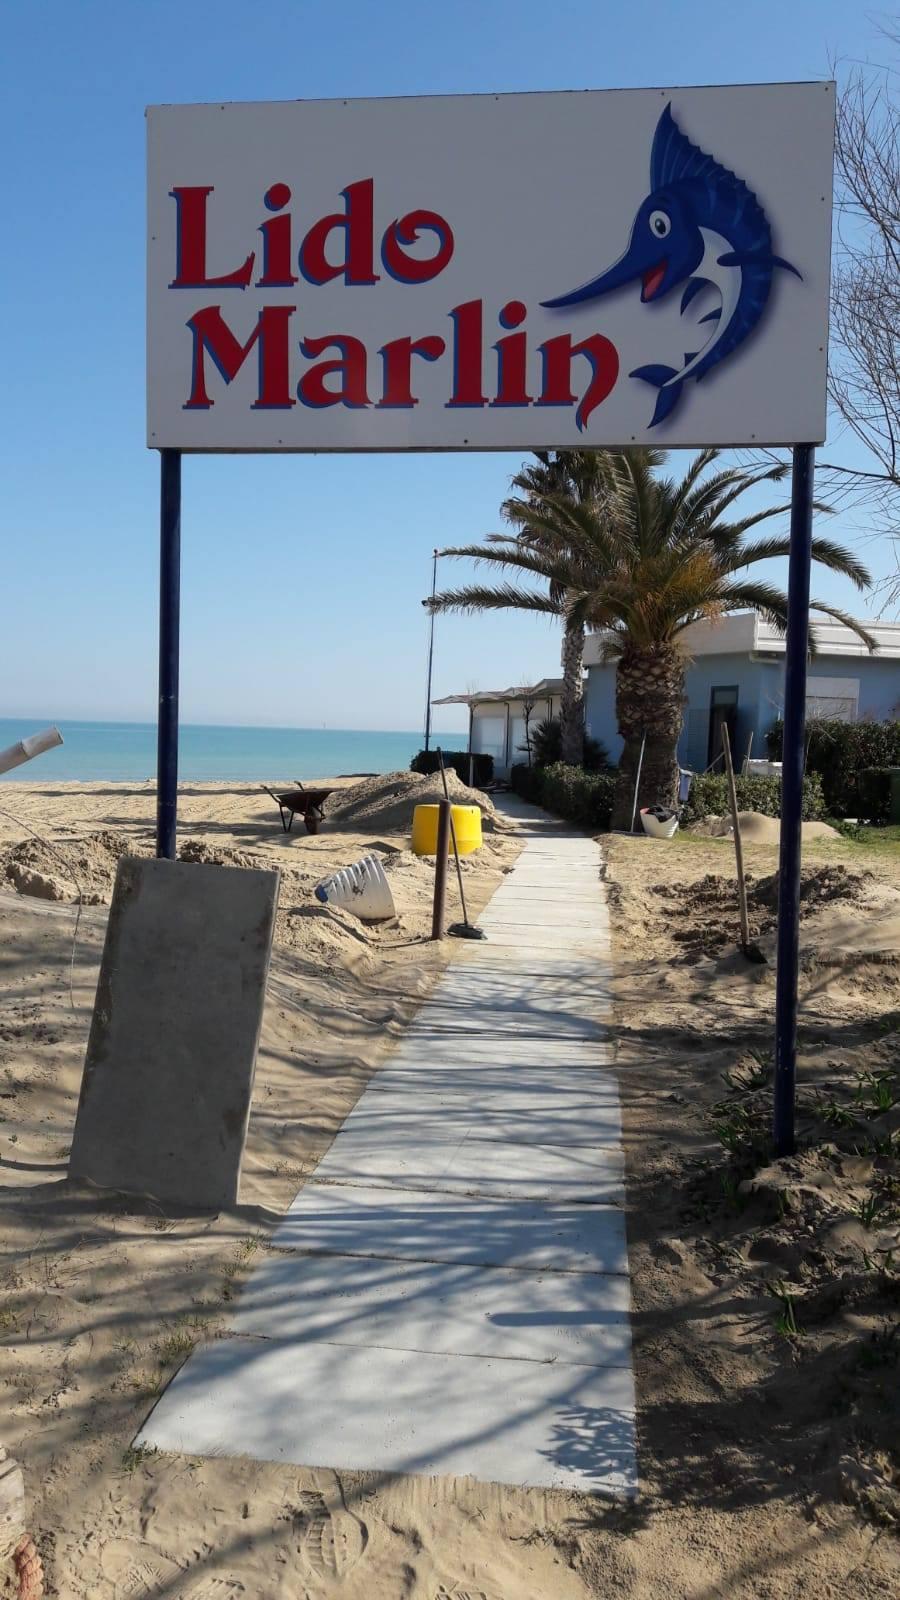 Lido Marlin